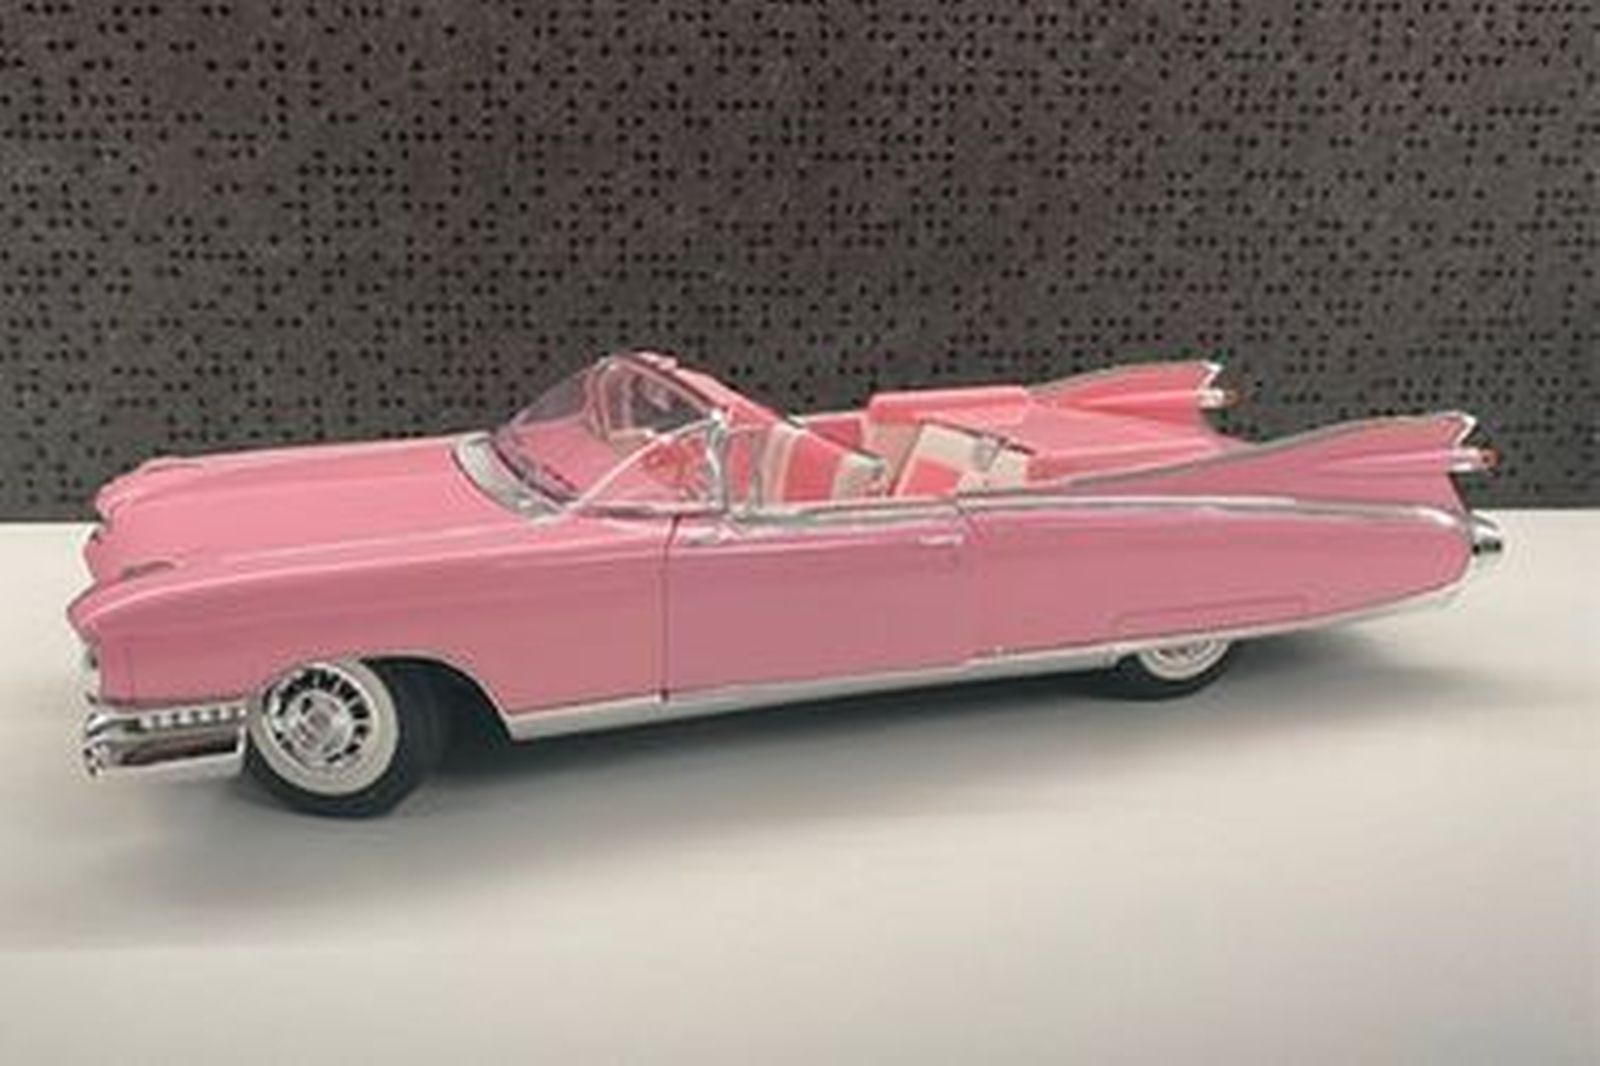 Maisto Model Car - 1959 Cadillac Eldorado Pink (Scale: 1:12)